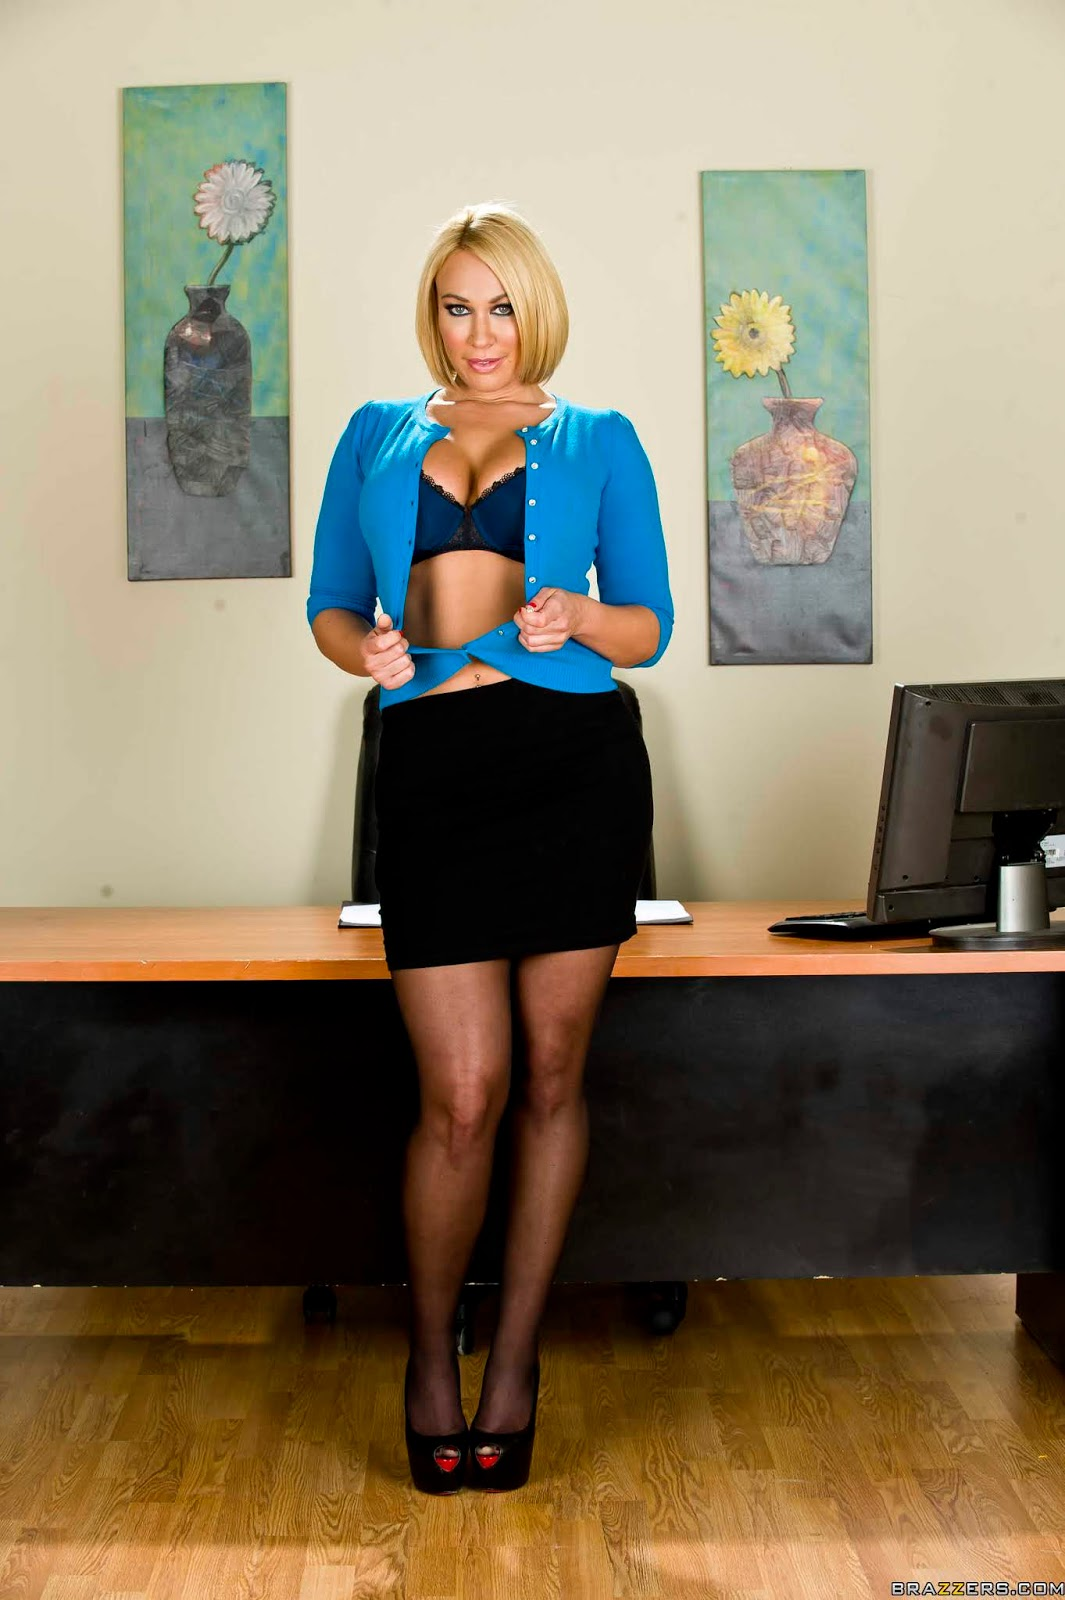 Mellanie Monroe : Office Snatch ## BRAZZERSf6vw1p2e7a.jpg